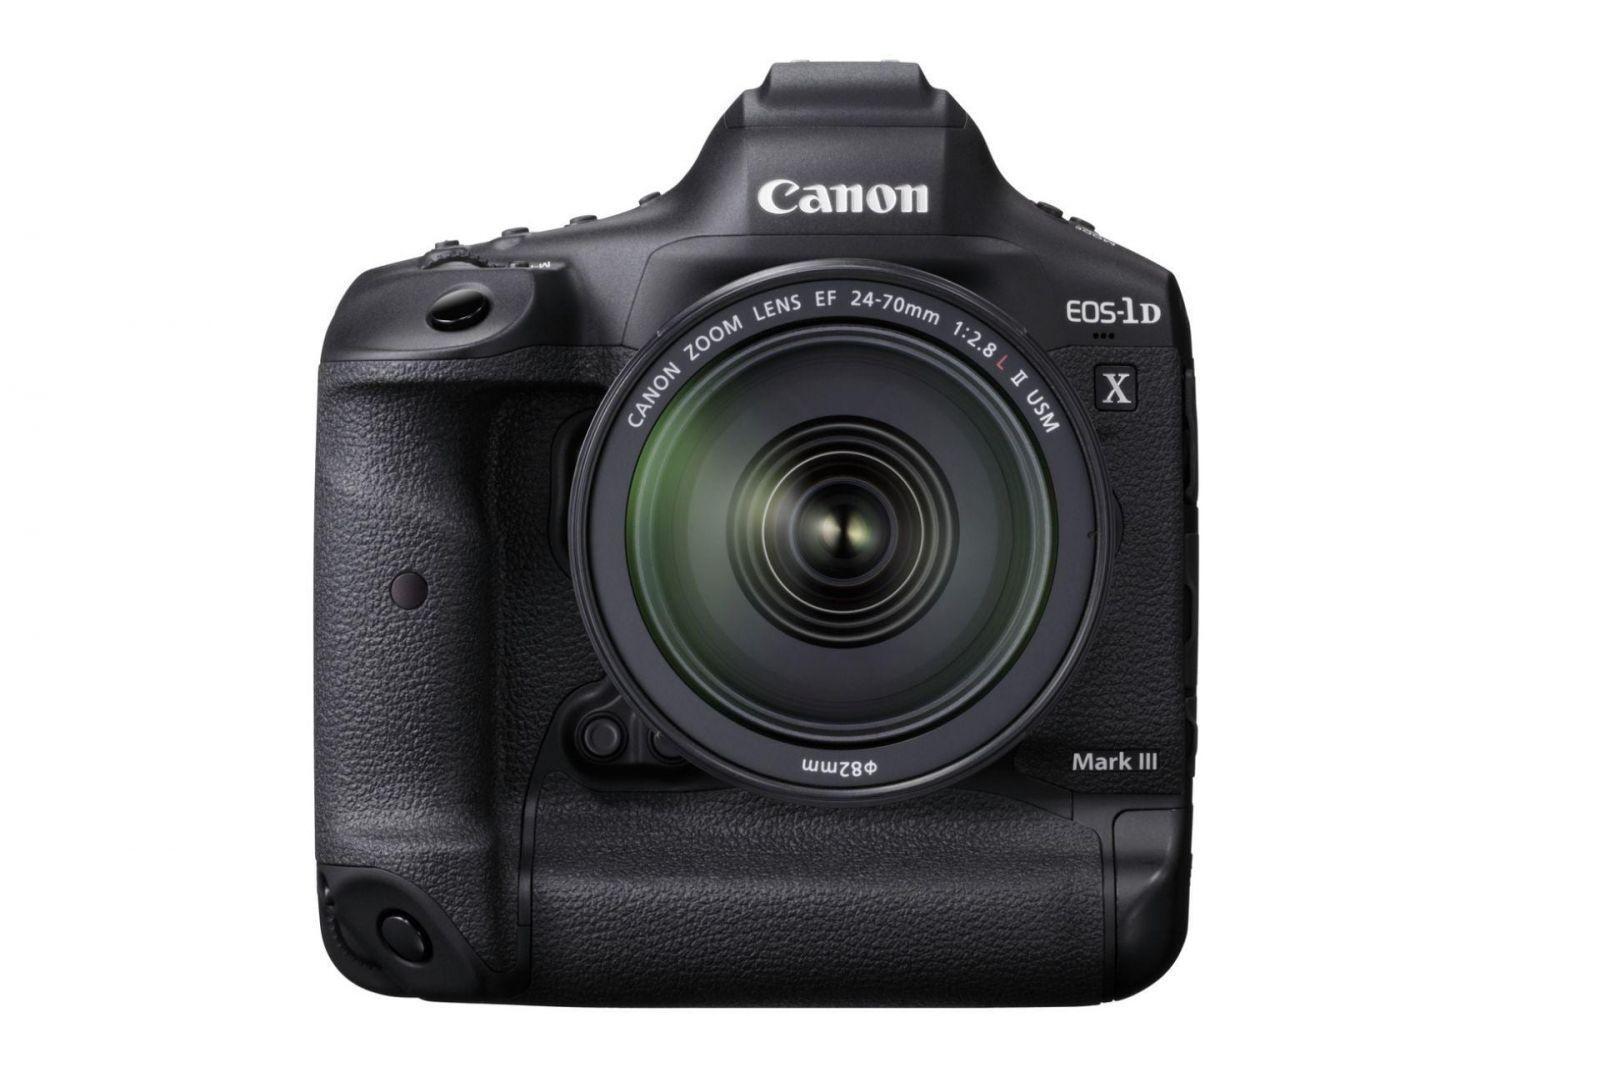 Canon анонсировал разработку EOS-1D X Mark III (eos 1d x mark iii frt)